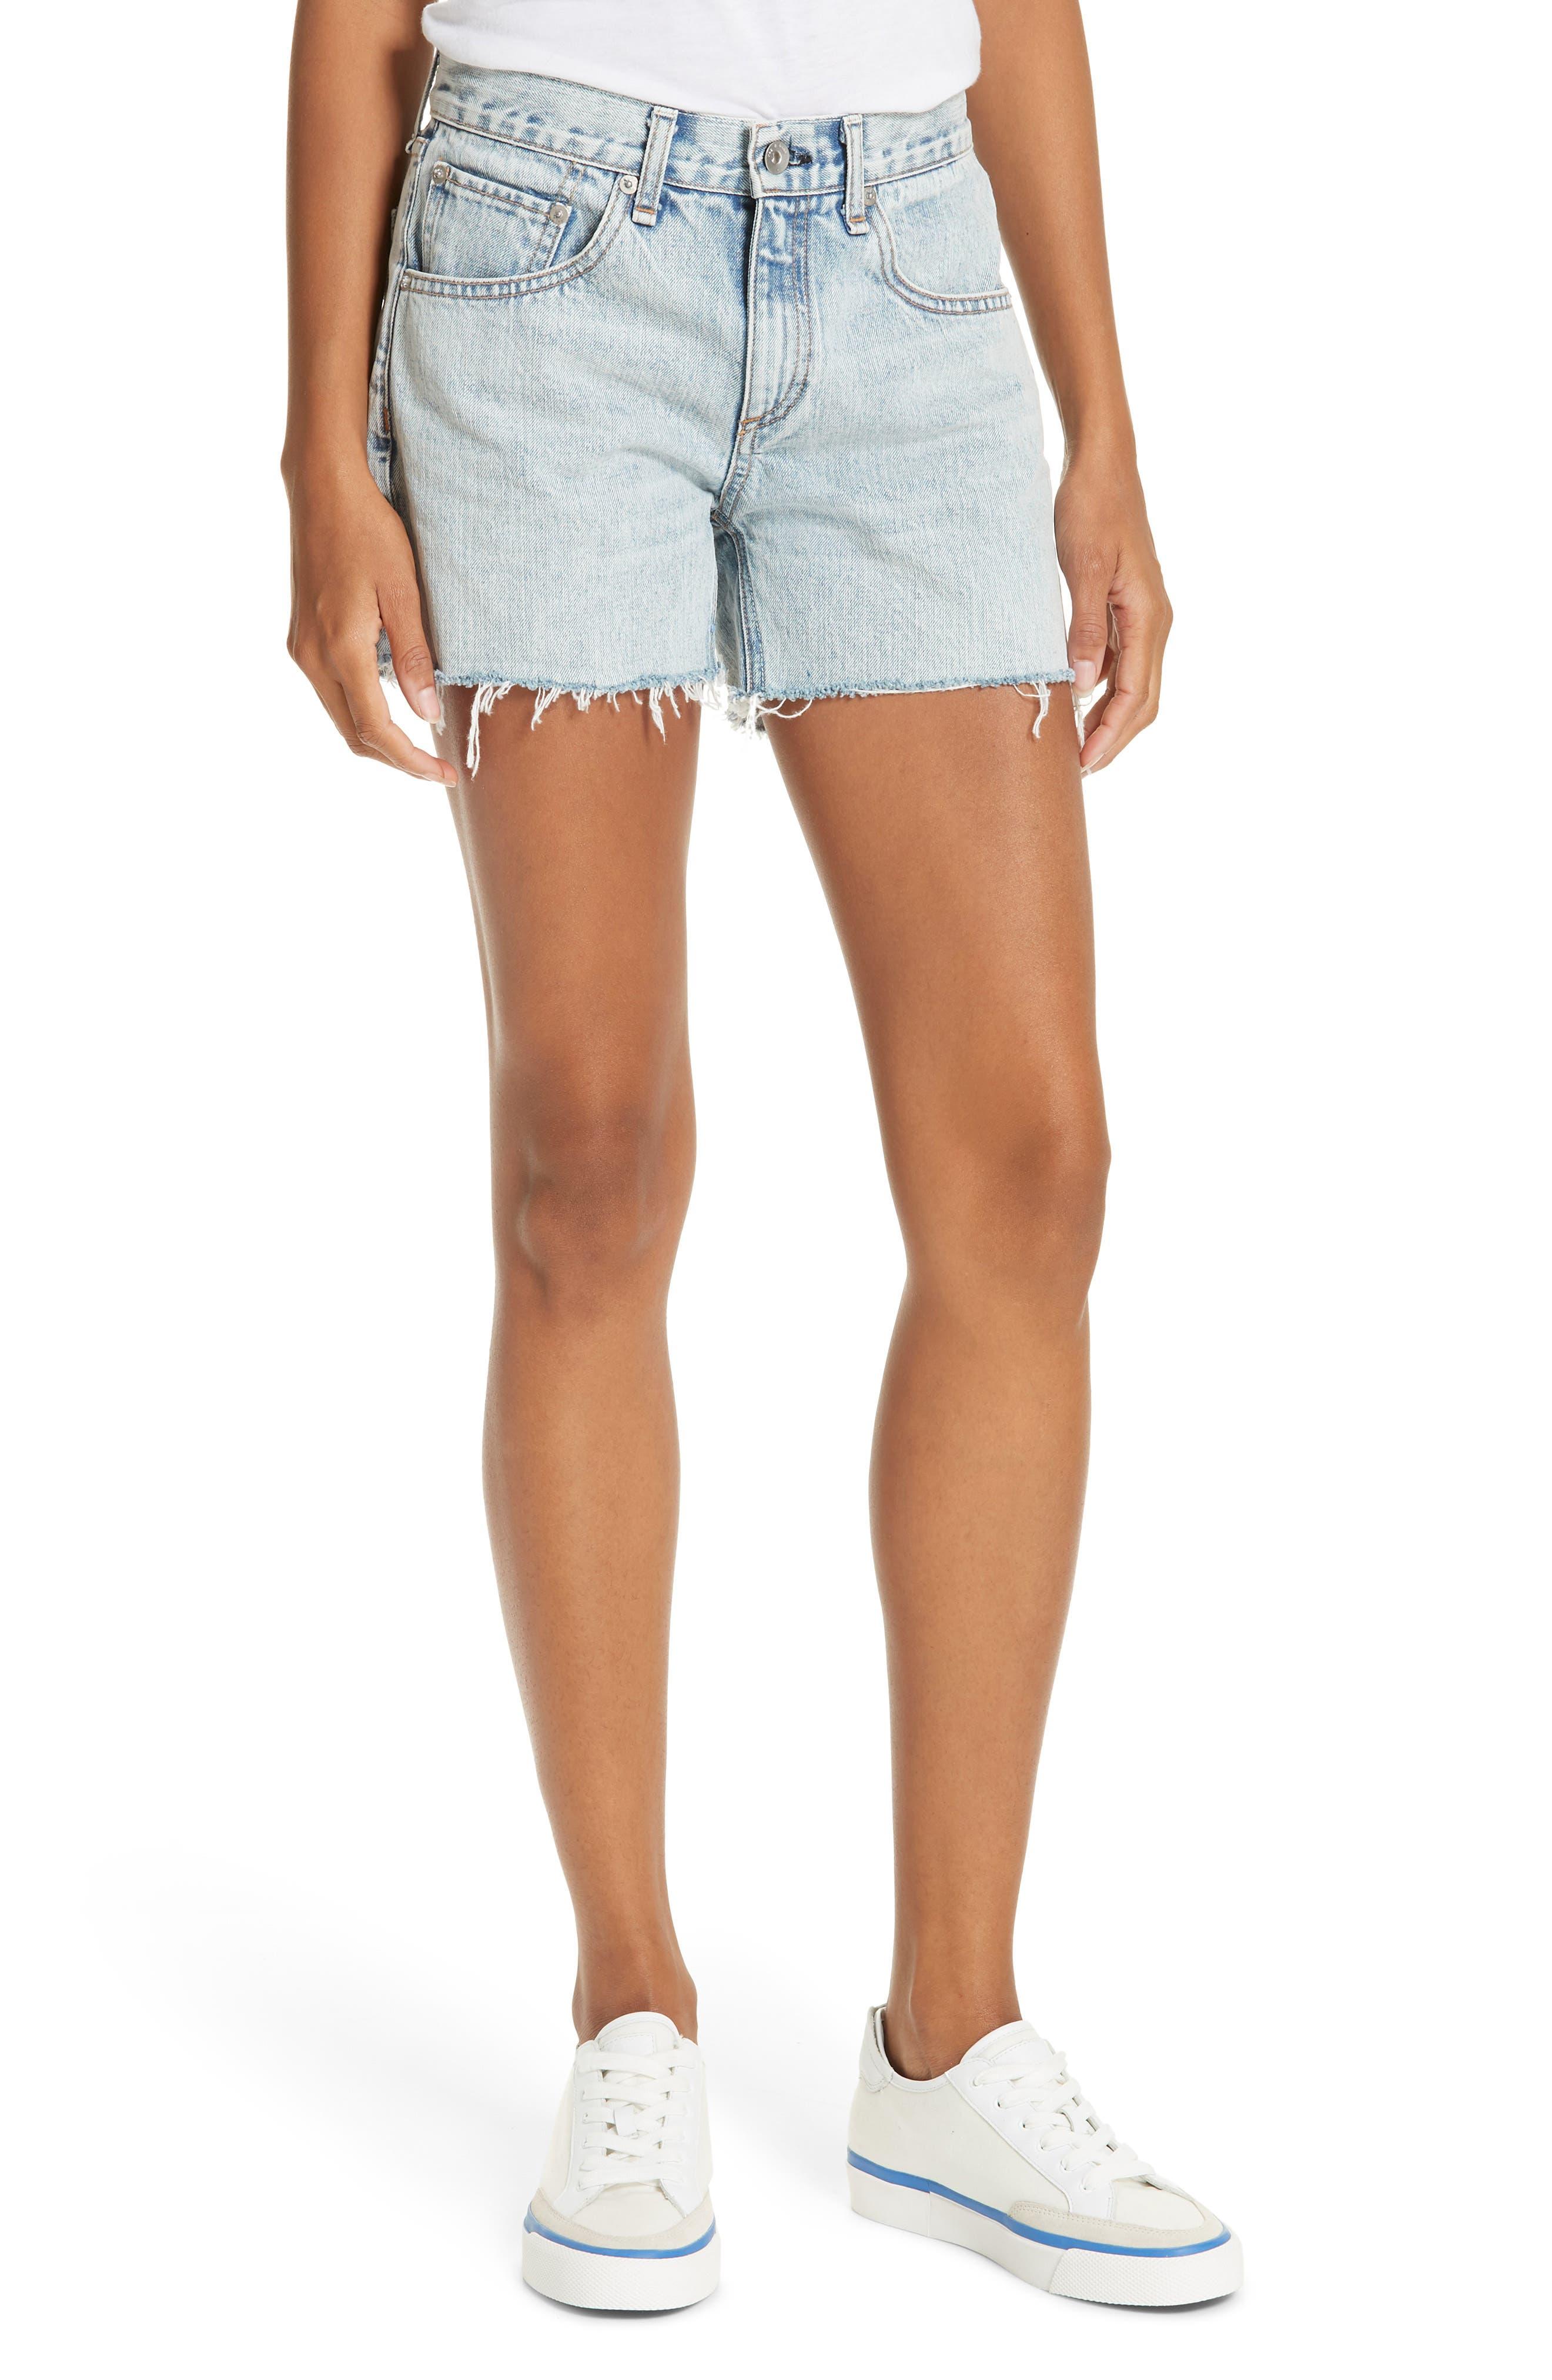 RAG & BONE JEAN Cutoff Boyfriend Shorts, Main, color, 420